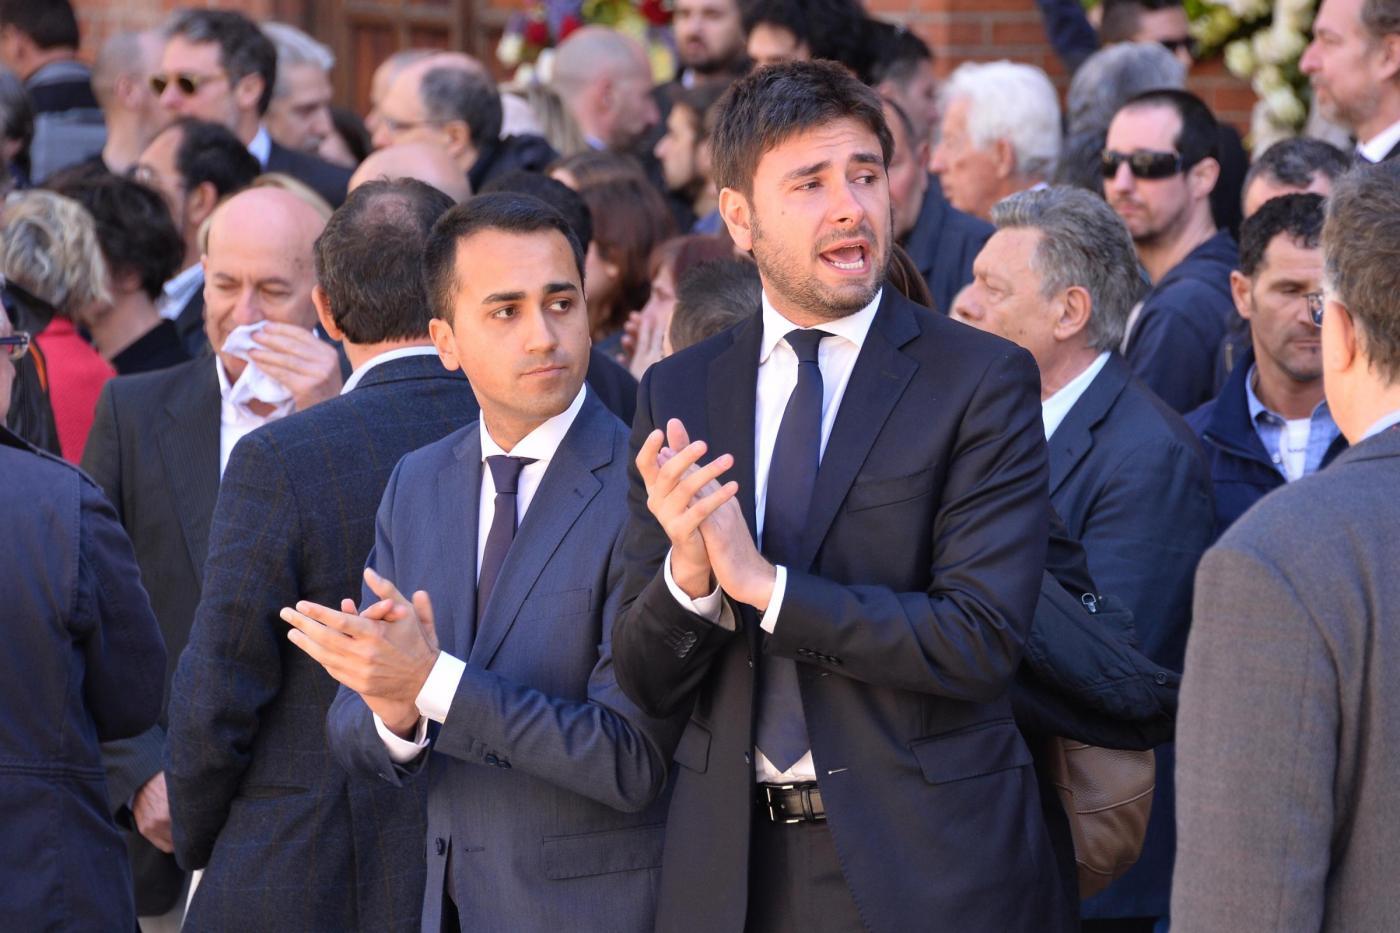 Funerale Gianroberto Casaleggio a Milano